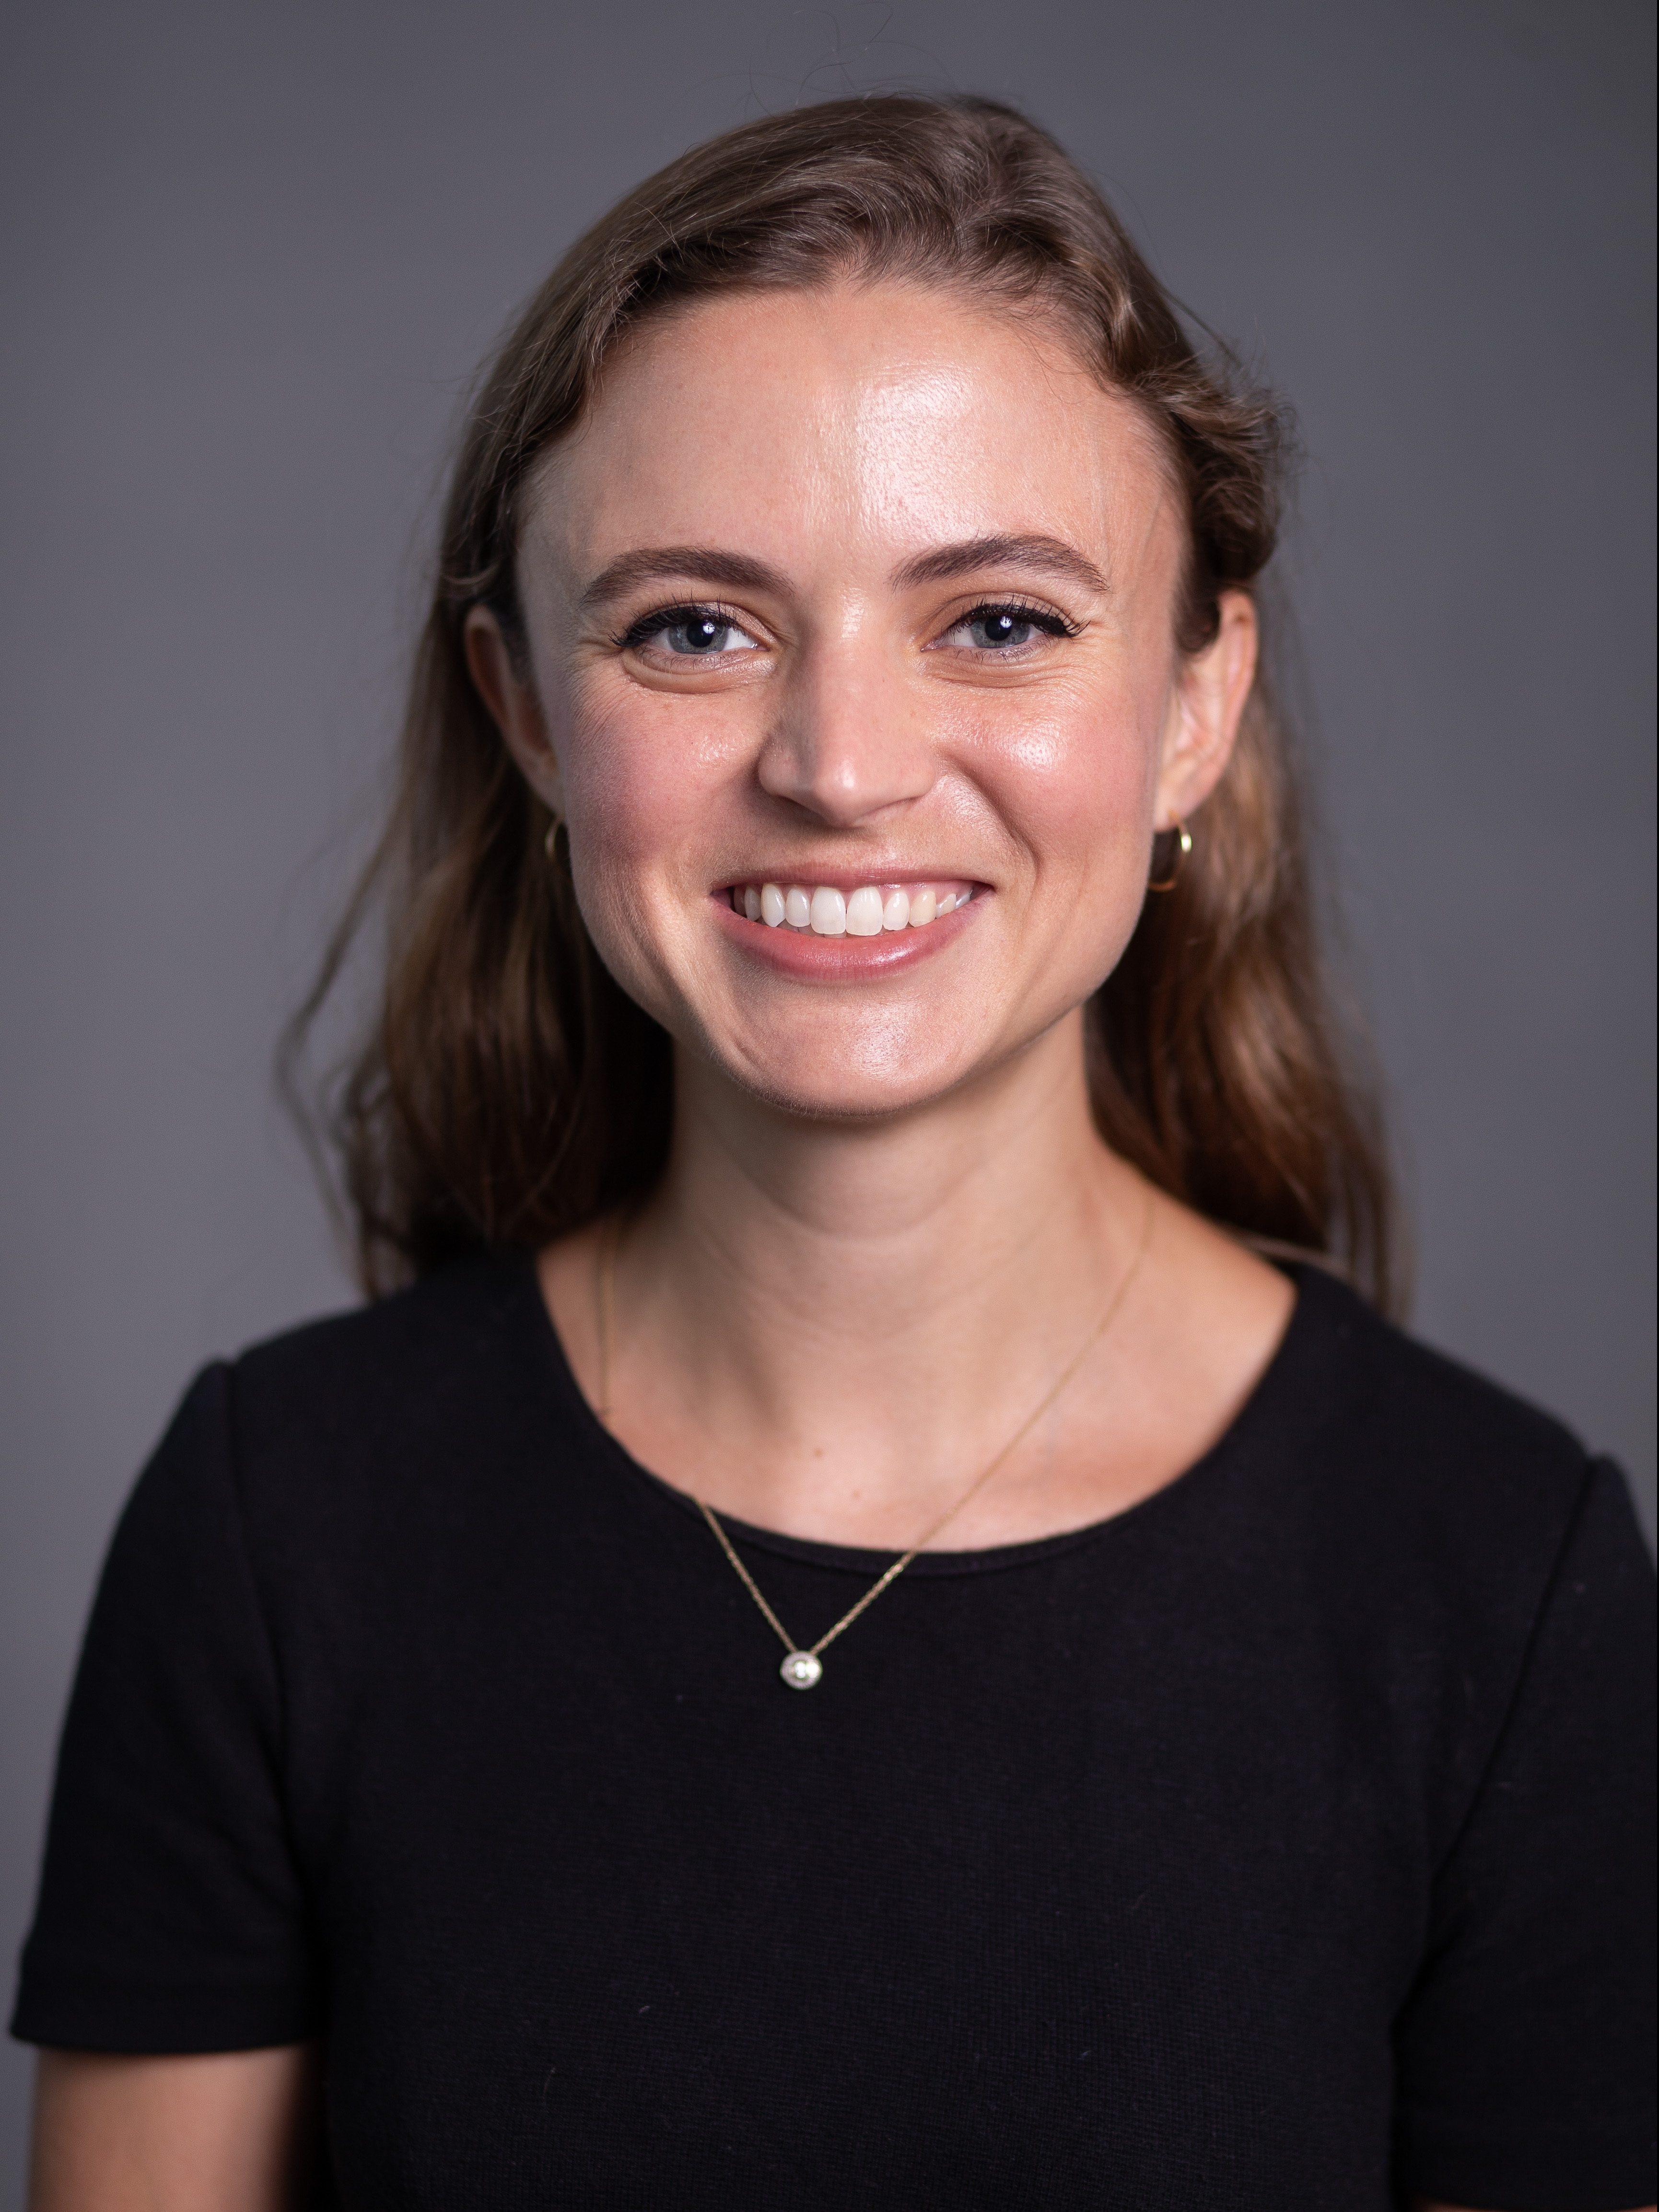 Katherine Wolff headshot 9.19